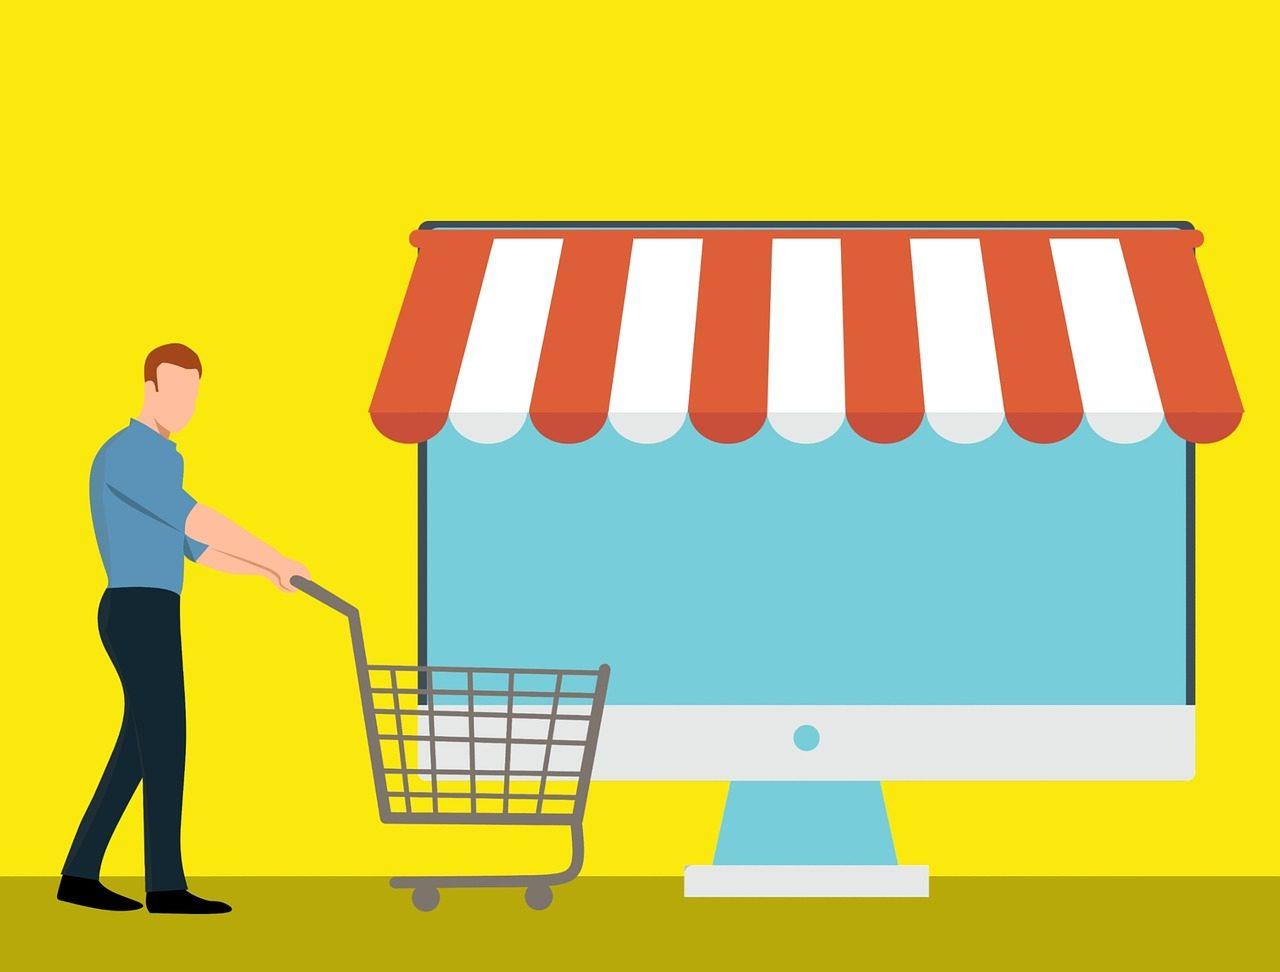 online-store-3265497_1280-1280x972.jpg